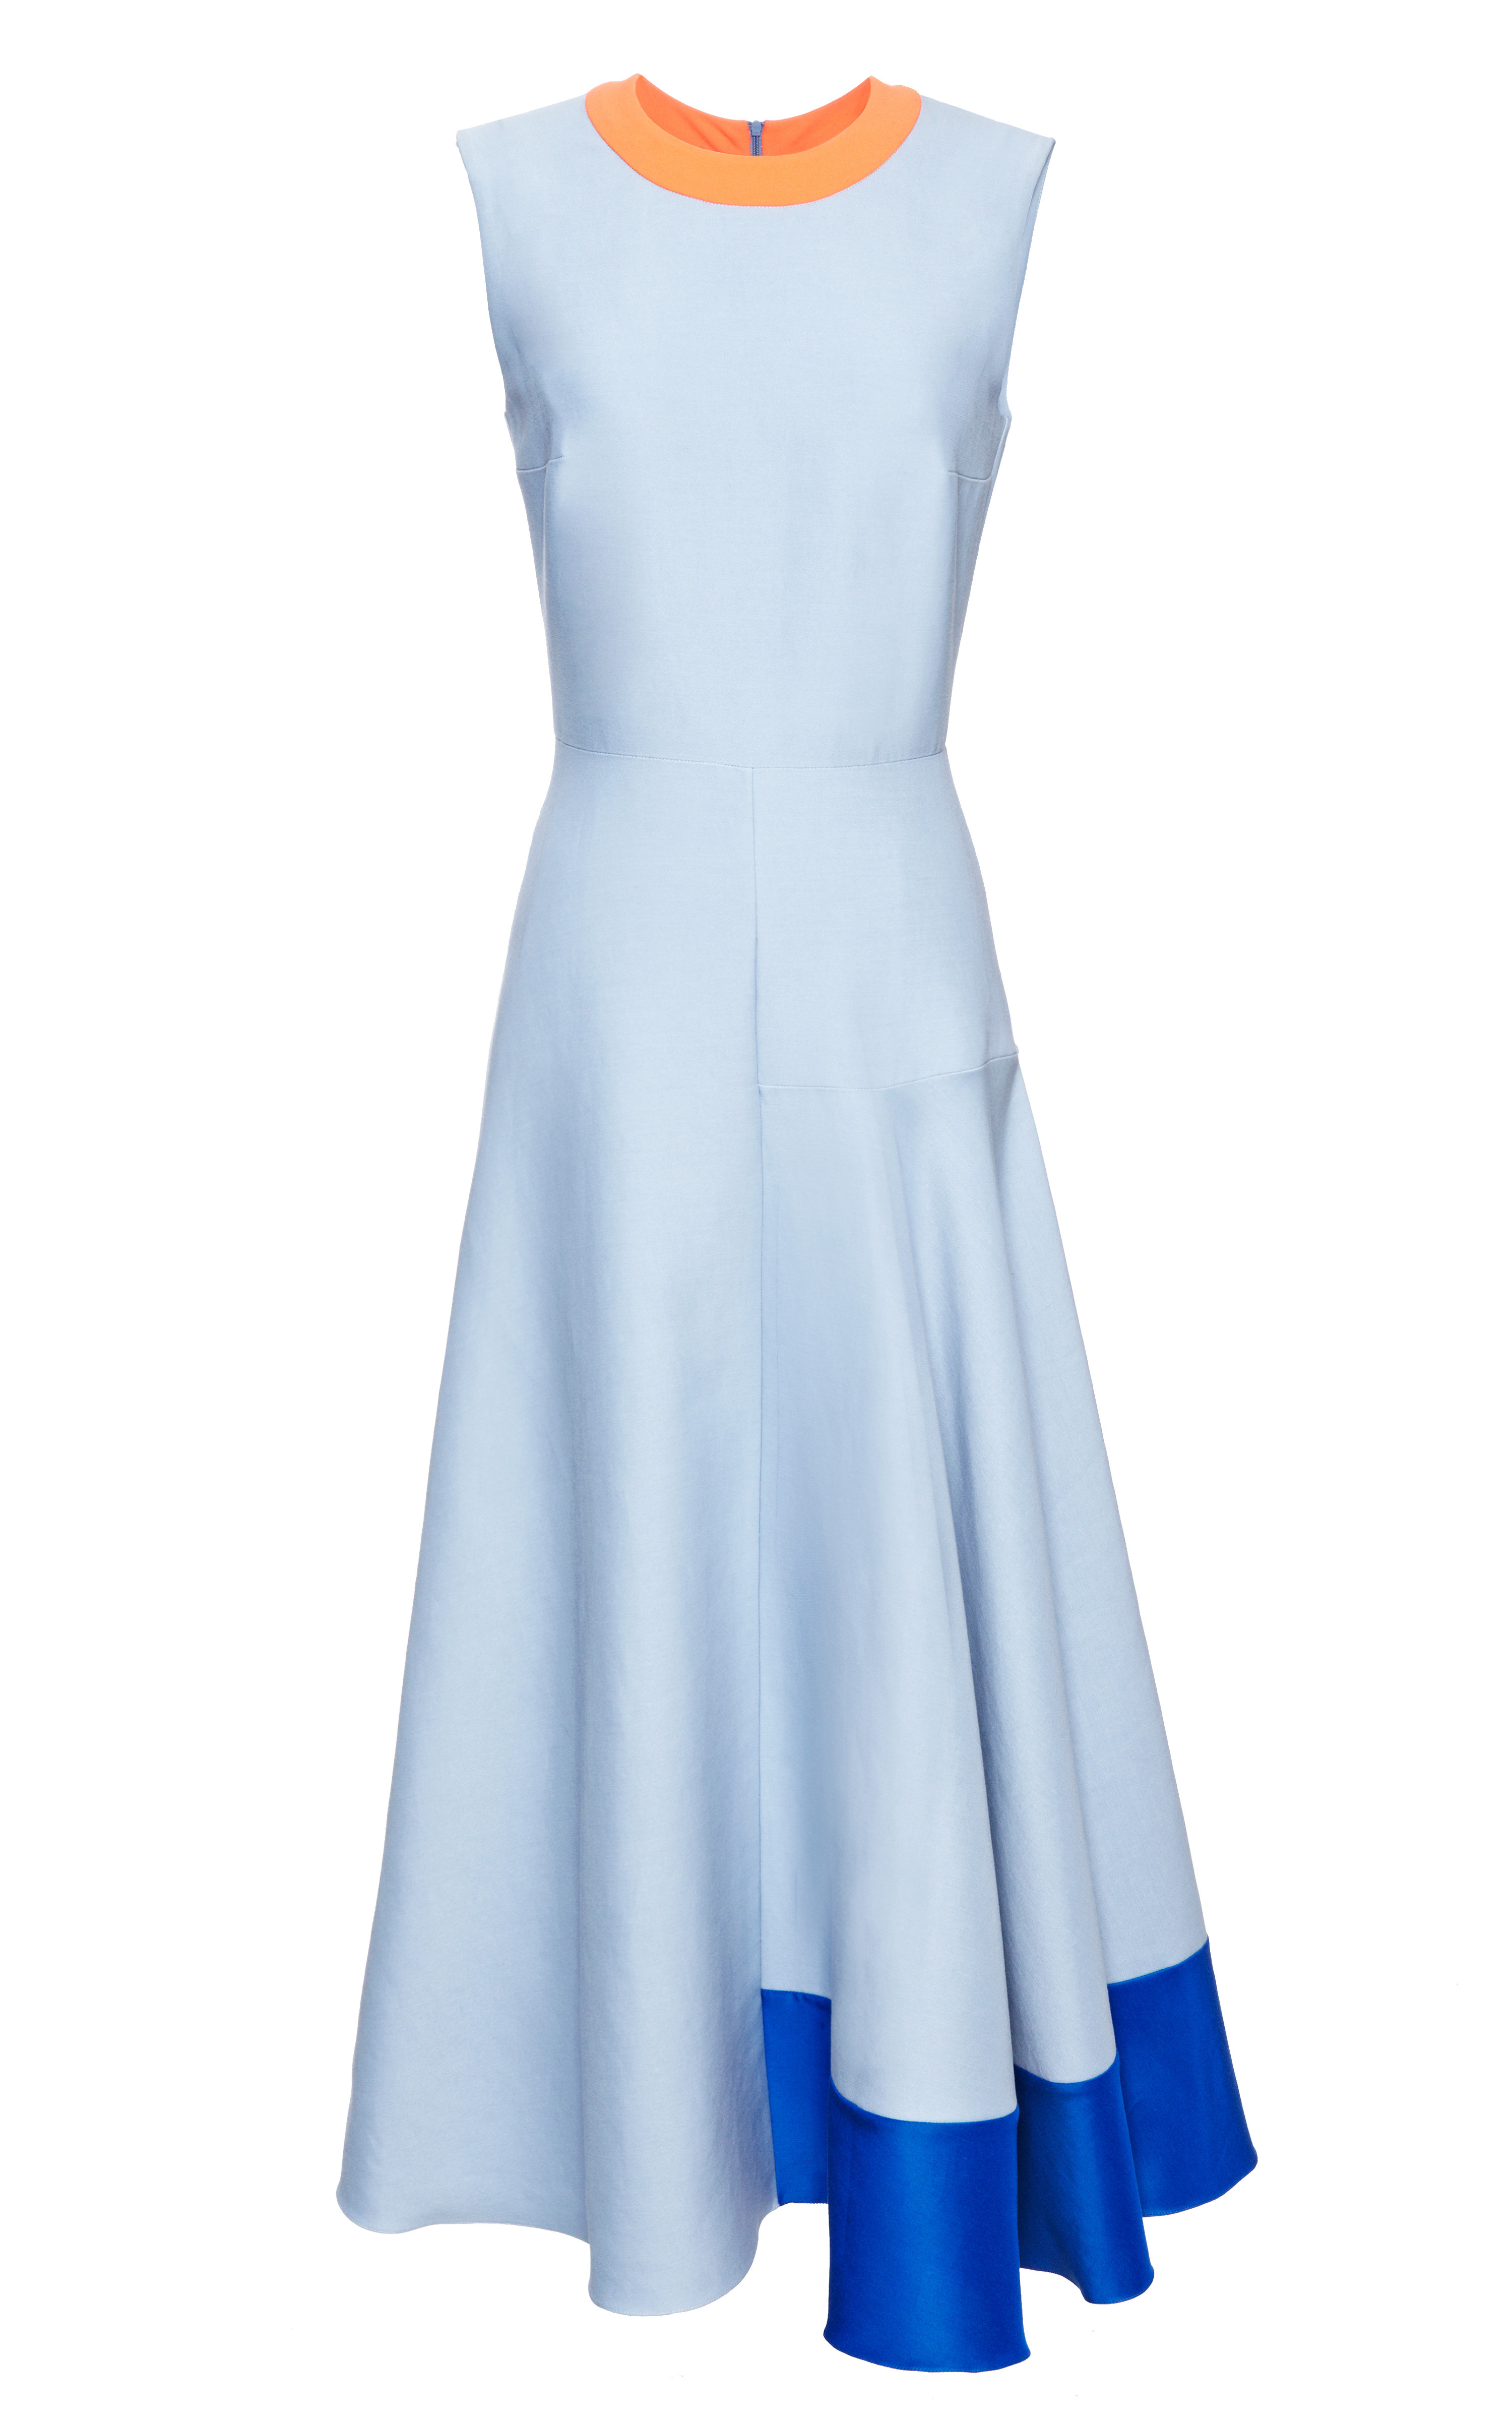 46d18acbb00 Lyst - ROKSANDA Blue Orla Dress in Blue